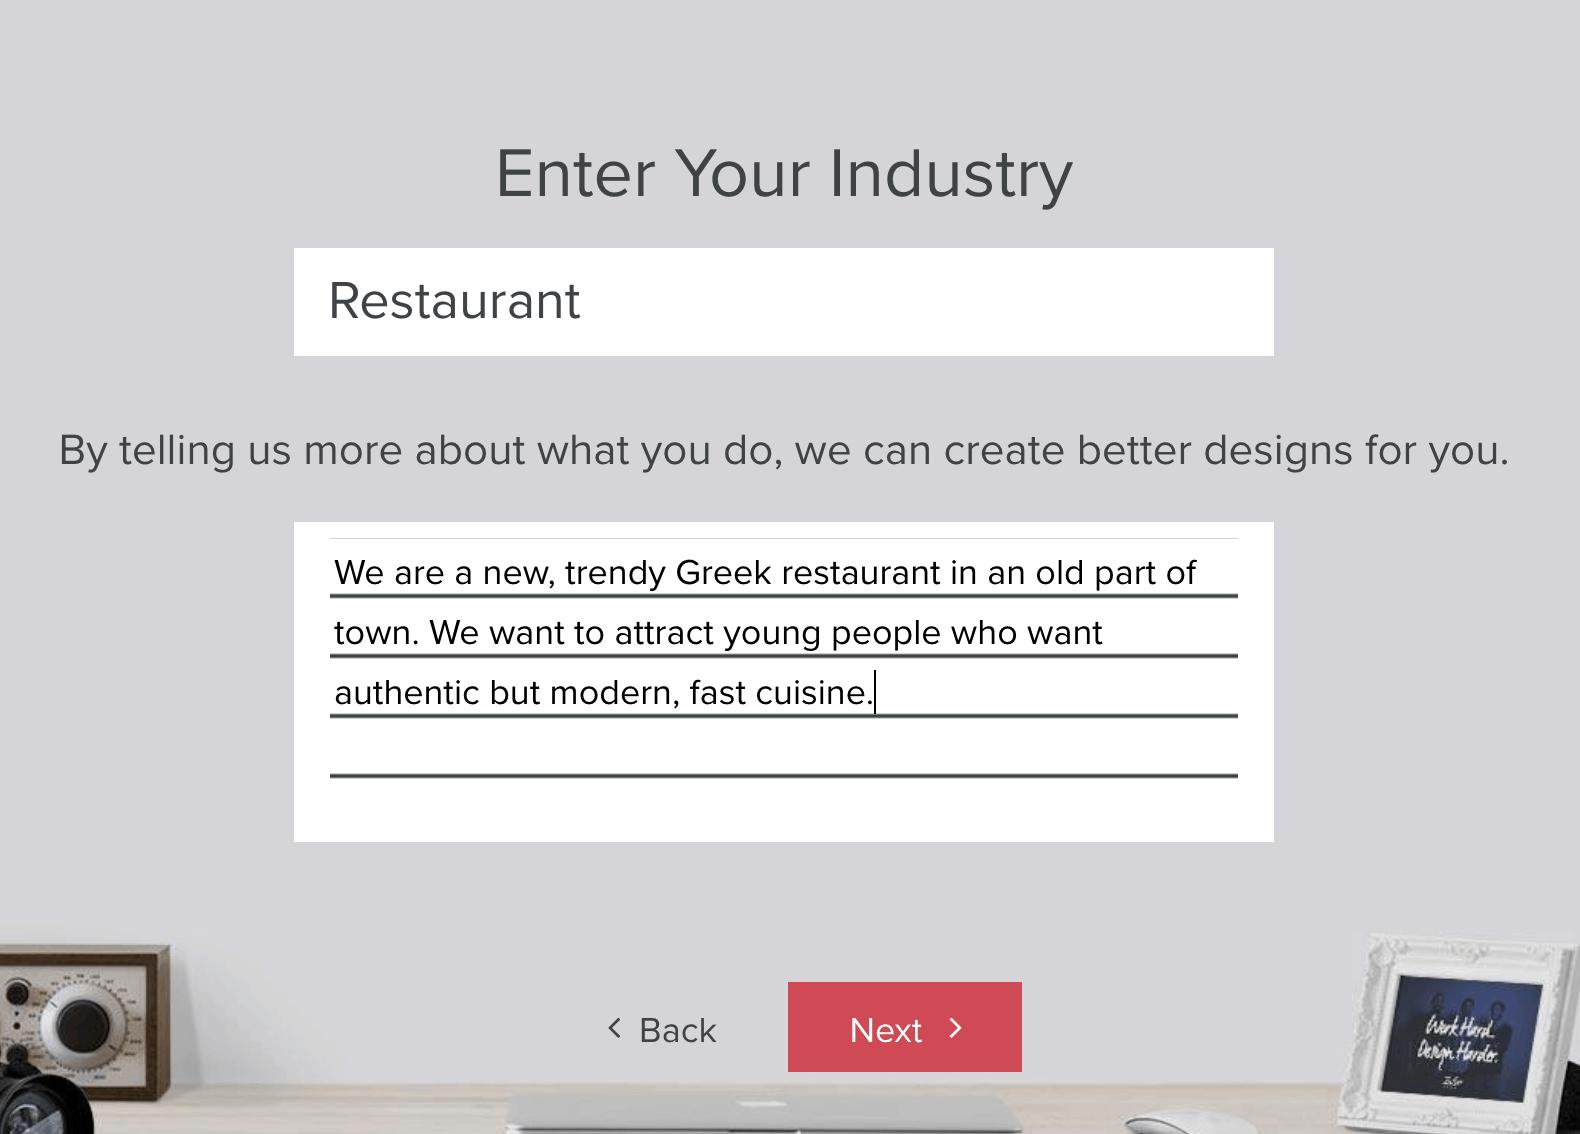 Tailor Brands screenshot - Enter Your Industry